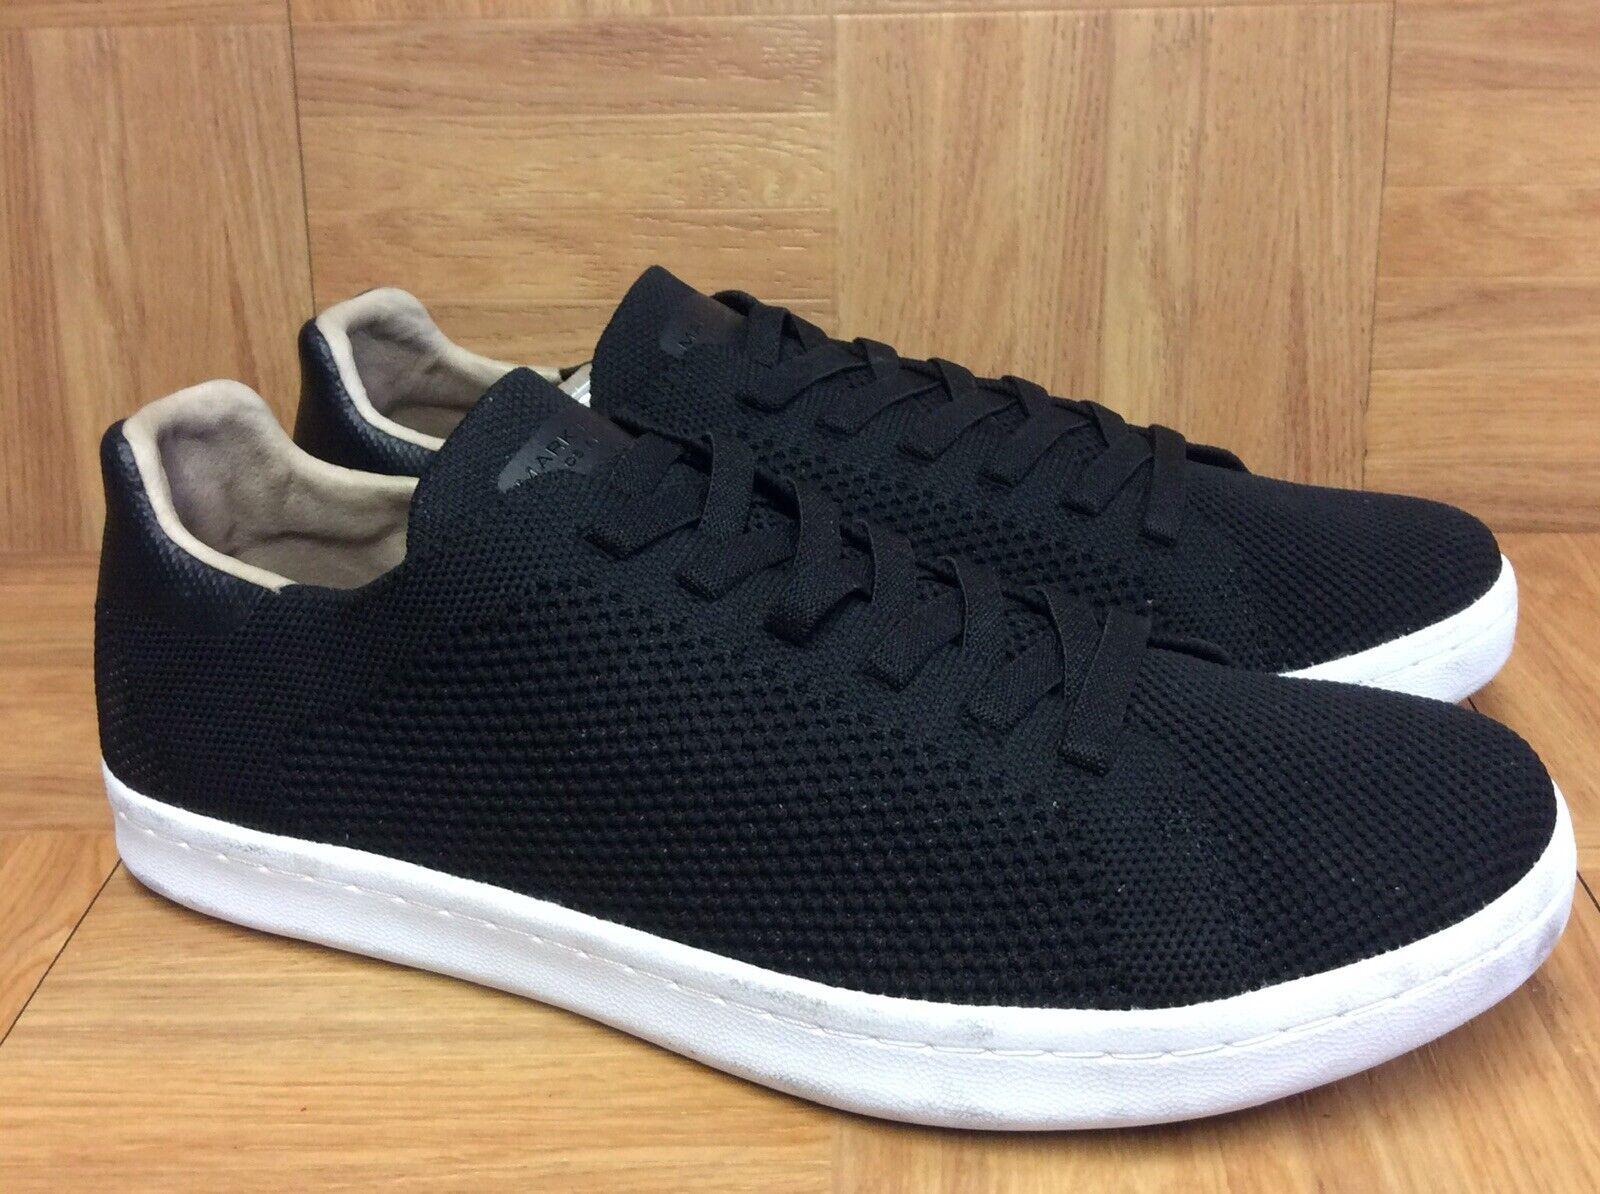 RARE Mark Nason Los Angeles Bryson Fashion Sneakers Sz 9.5 68581 Men's shoes